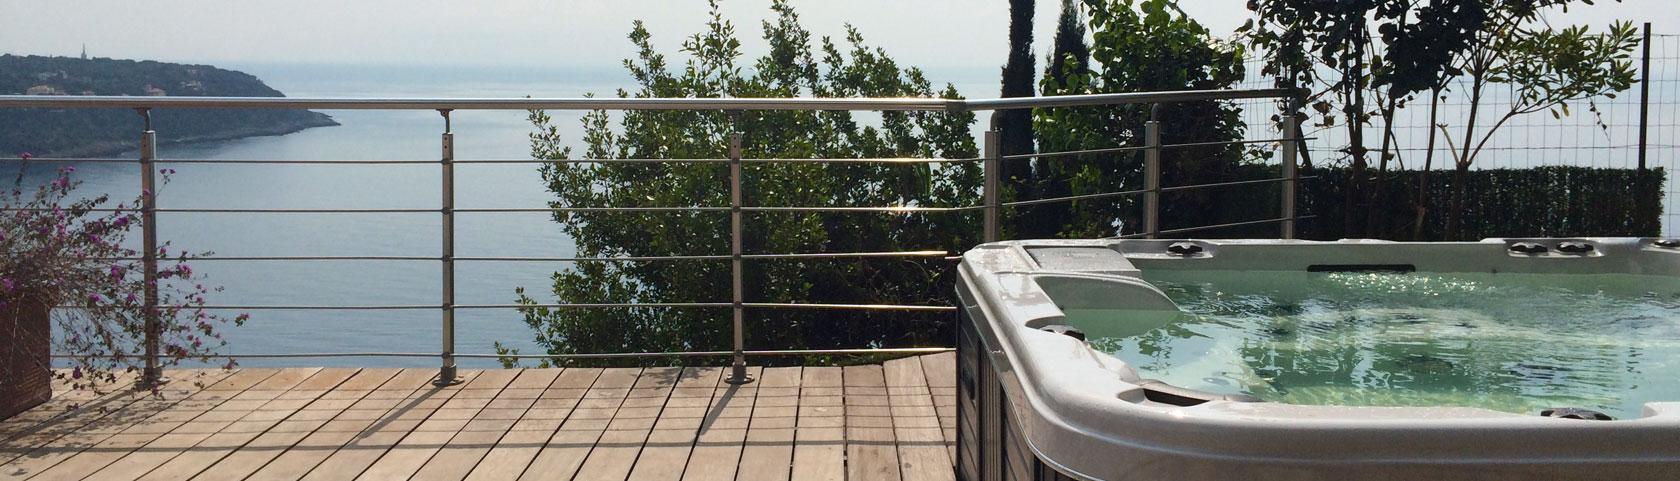 d terminer la temp rature de votre spa jacuzzi spa piscines nice. Black Bedroom Furniture Sets. Home Design Ideas